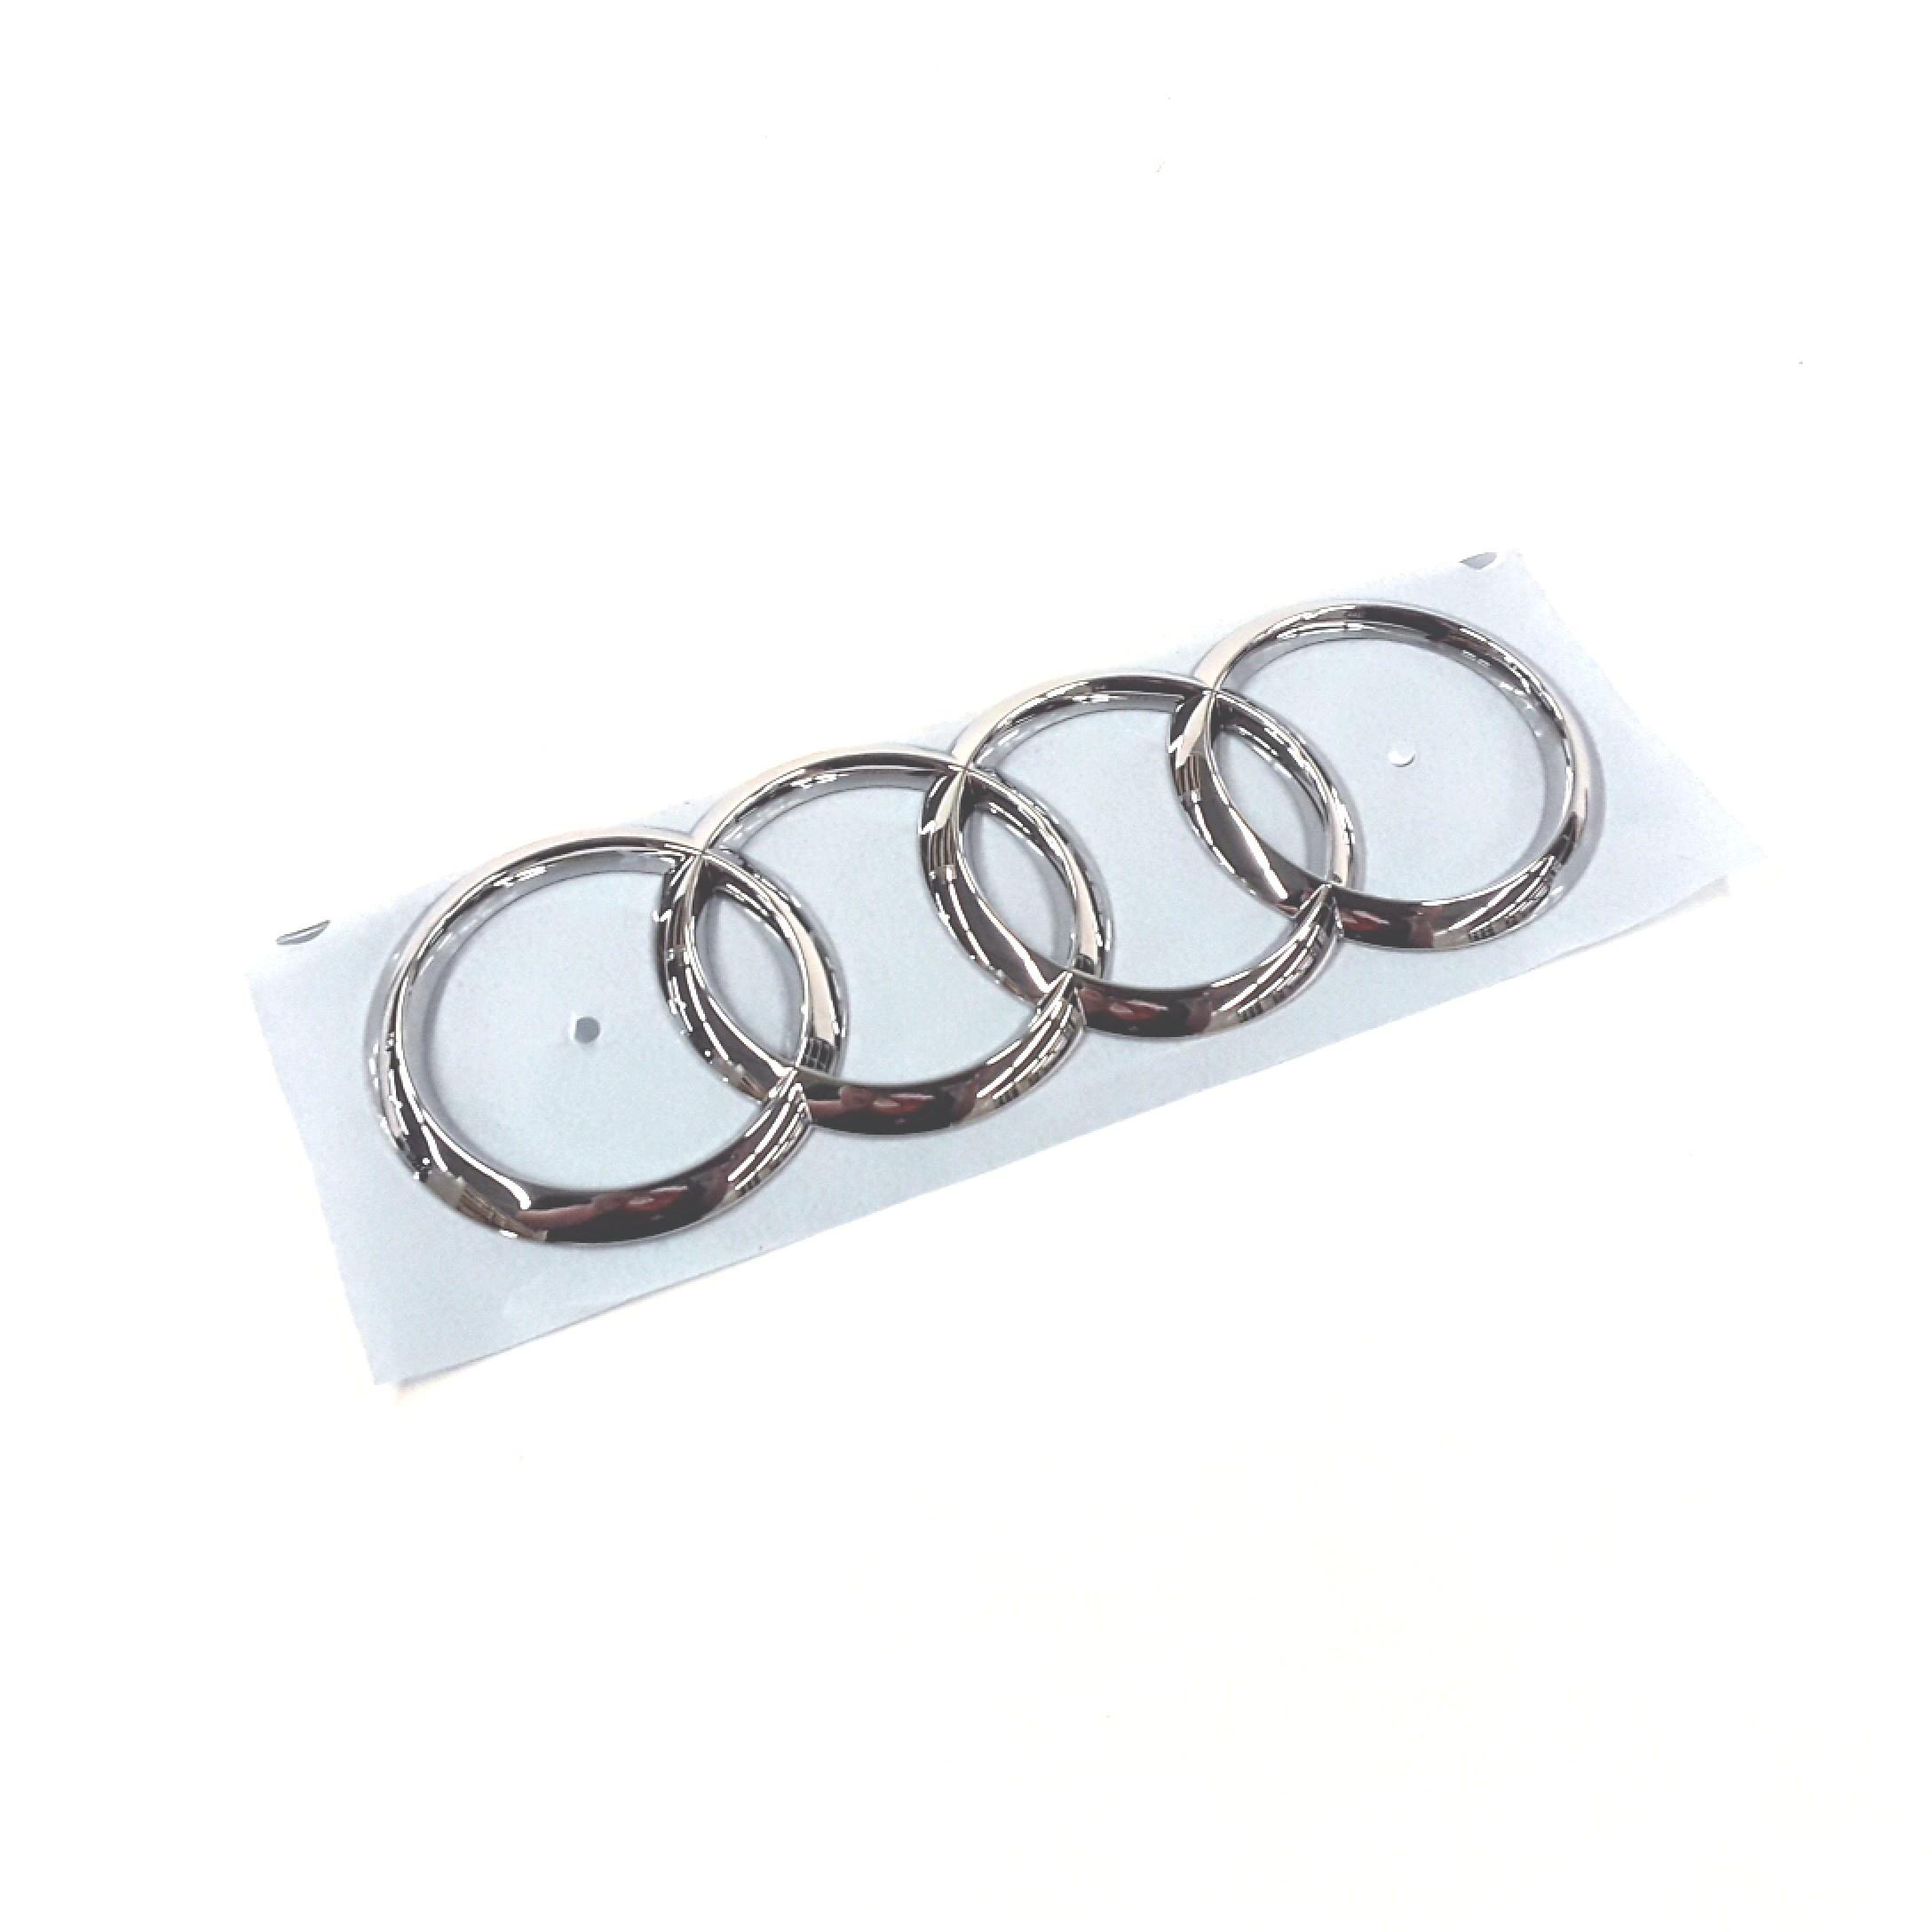 2017 Audi Tt Hood Emblem Ornament 8v08537422zz Jim